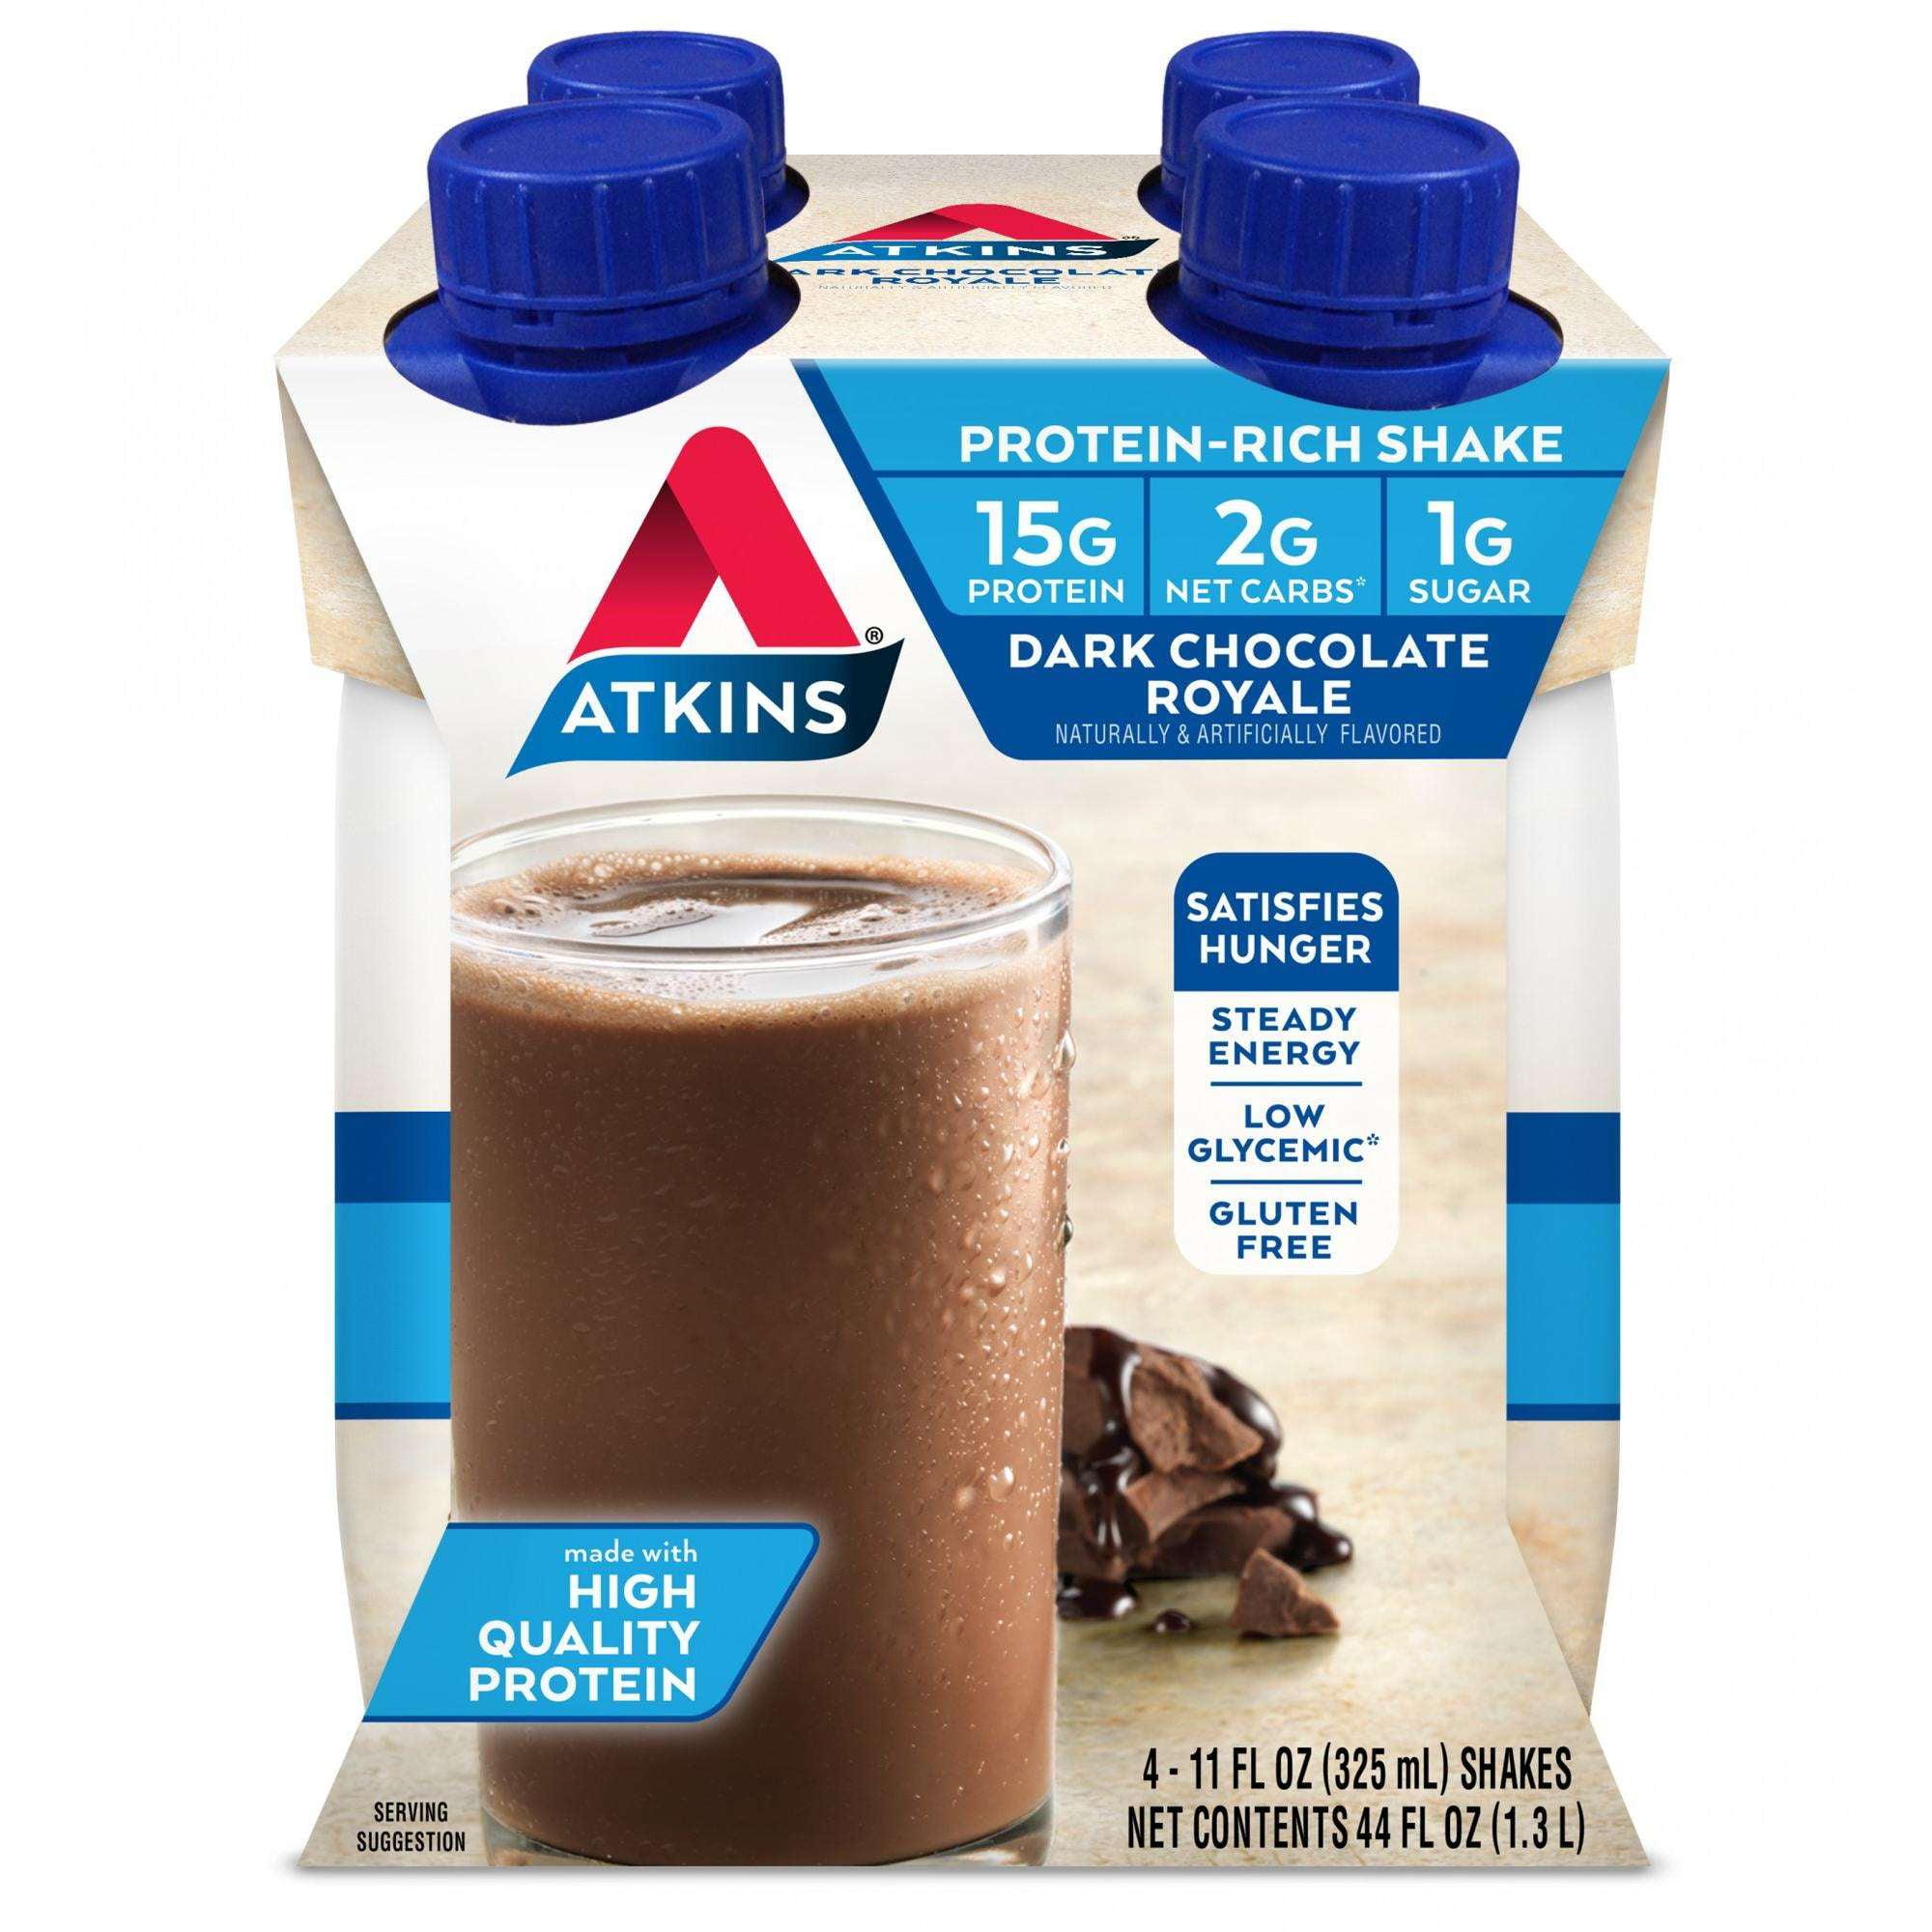 Atkins Dark Chocolate Royale Shake, 11 fl oz, 4-pack (Ready to Drink)